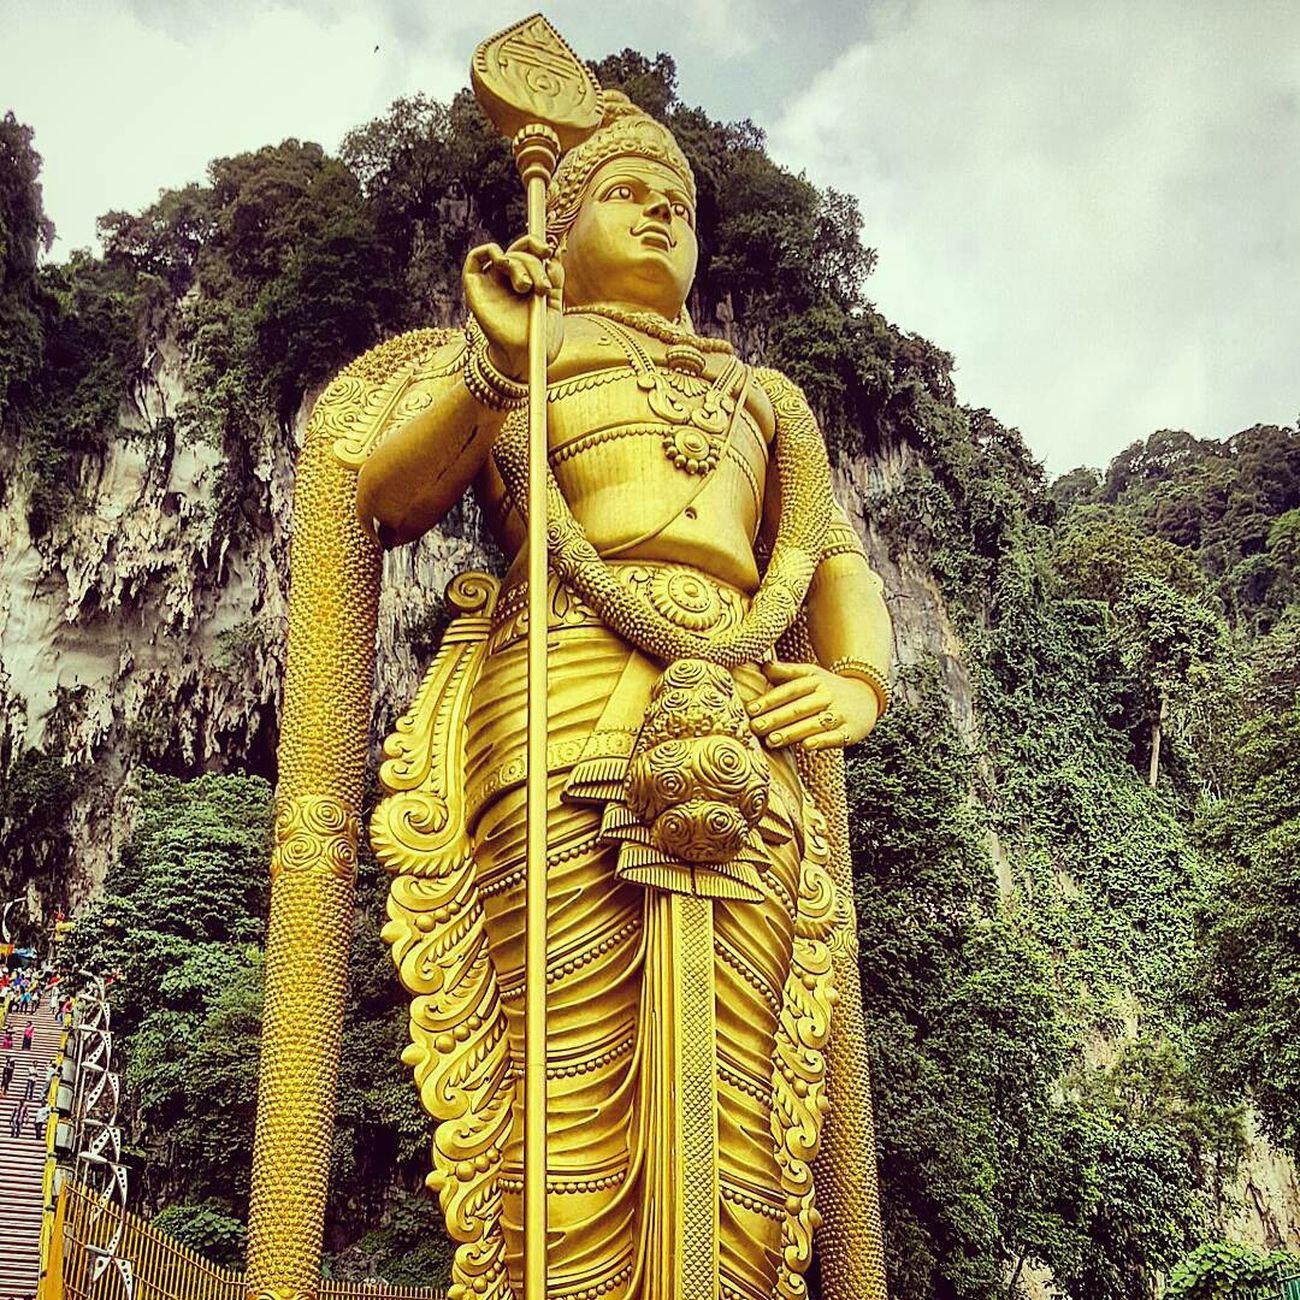 Lord Murugan Kuala Lumpur Temple Statue Gold Statue 43 Golden Moments